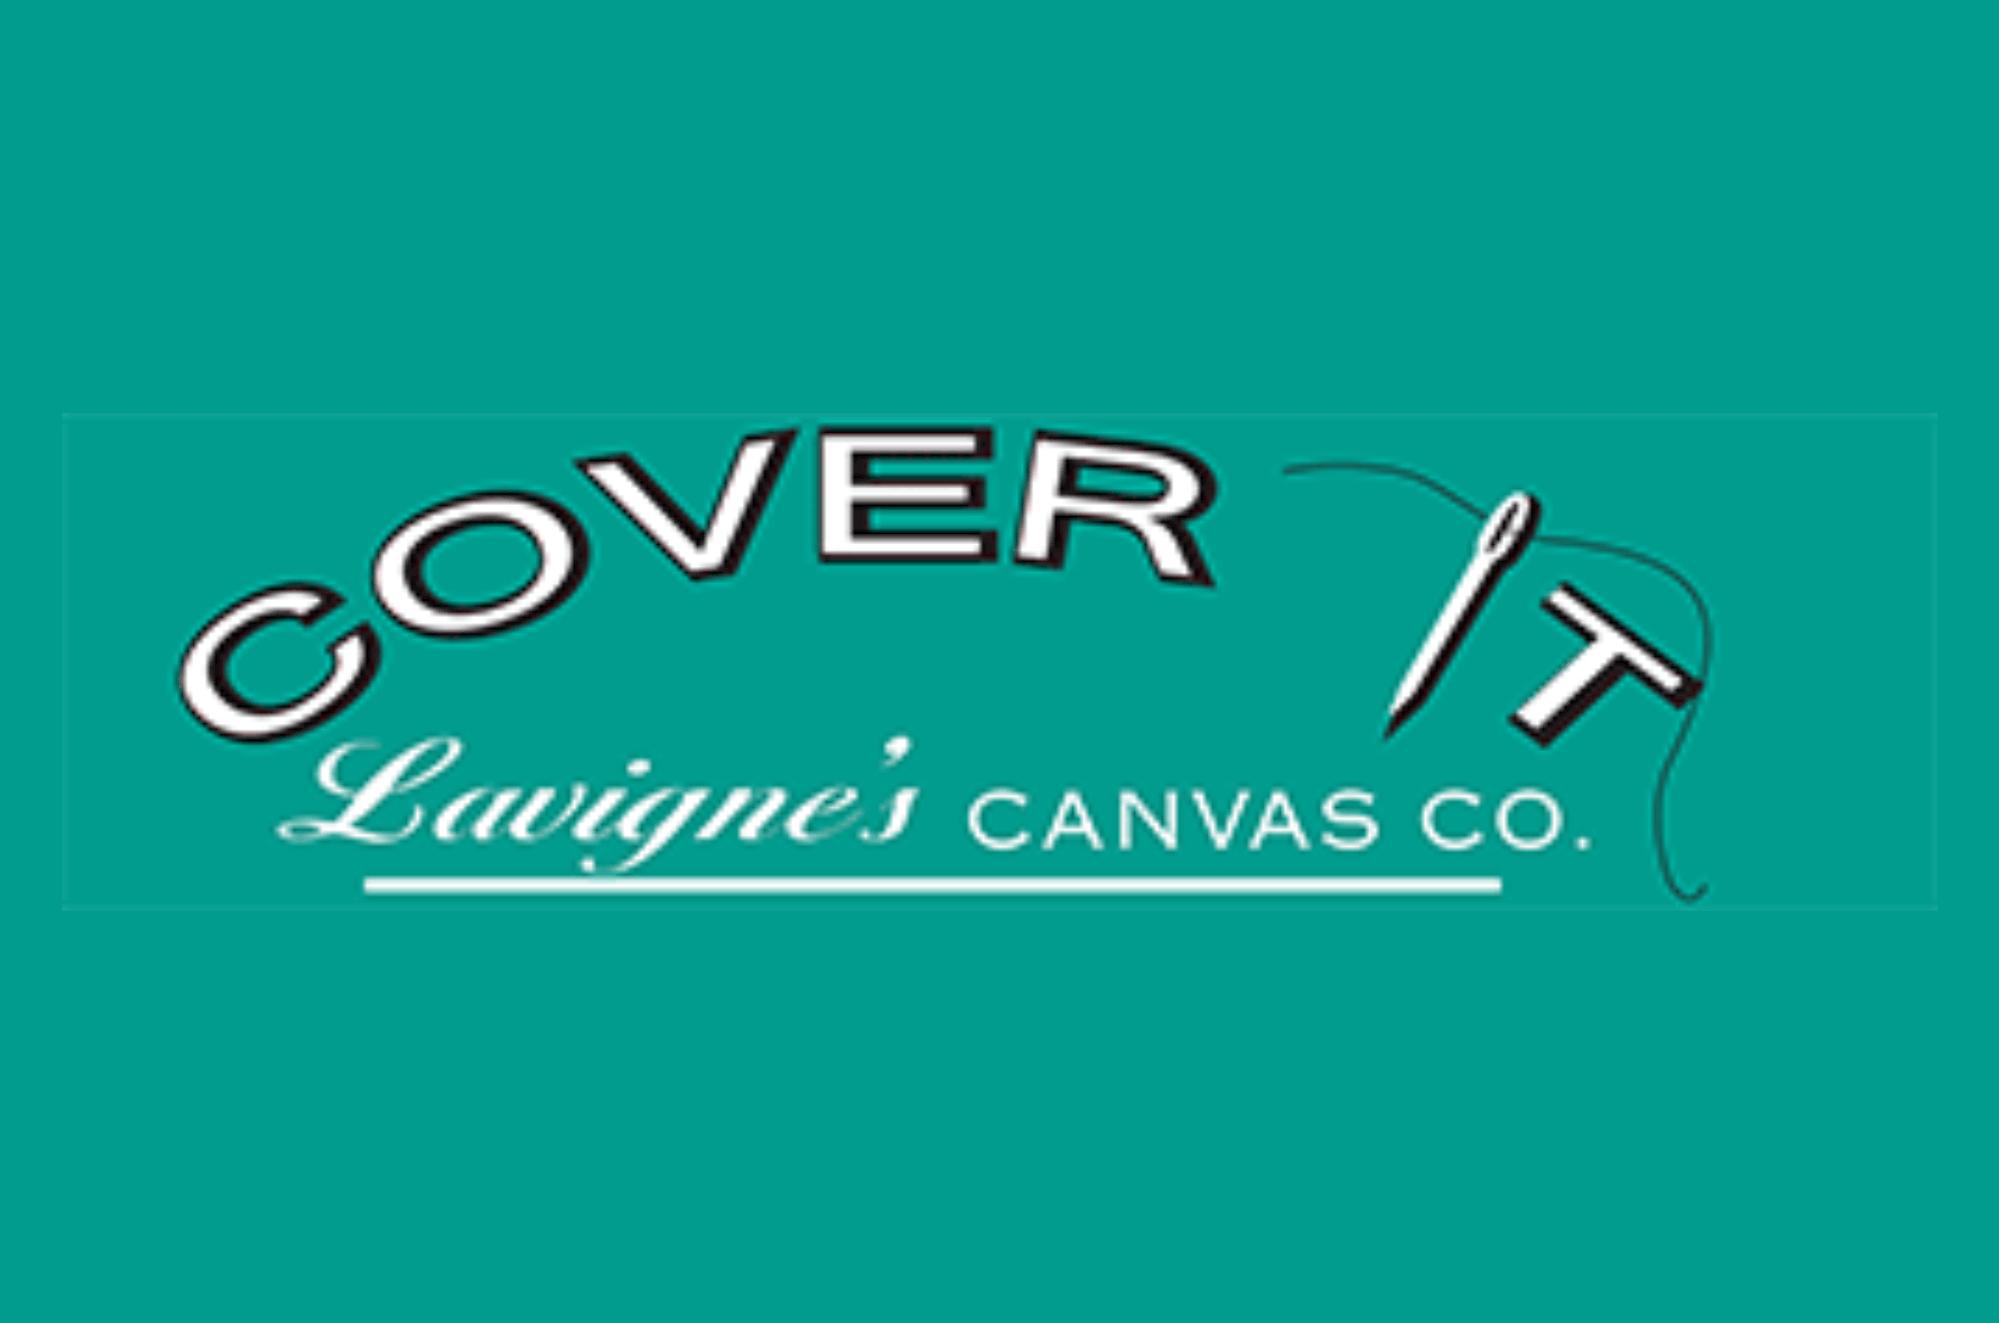 lavignes canvas Logo Design, website design, Internet Marketing, eCommerce, CRM lavignes canvas Logo Design, website design, Branding, Marketing, Website Maintenance and Hosting, Shopify